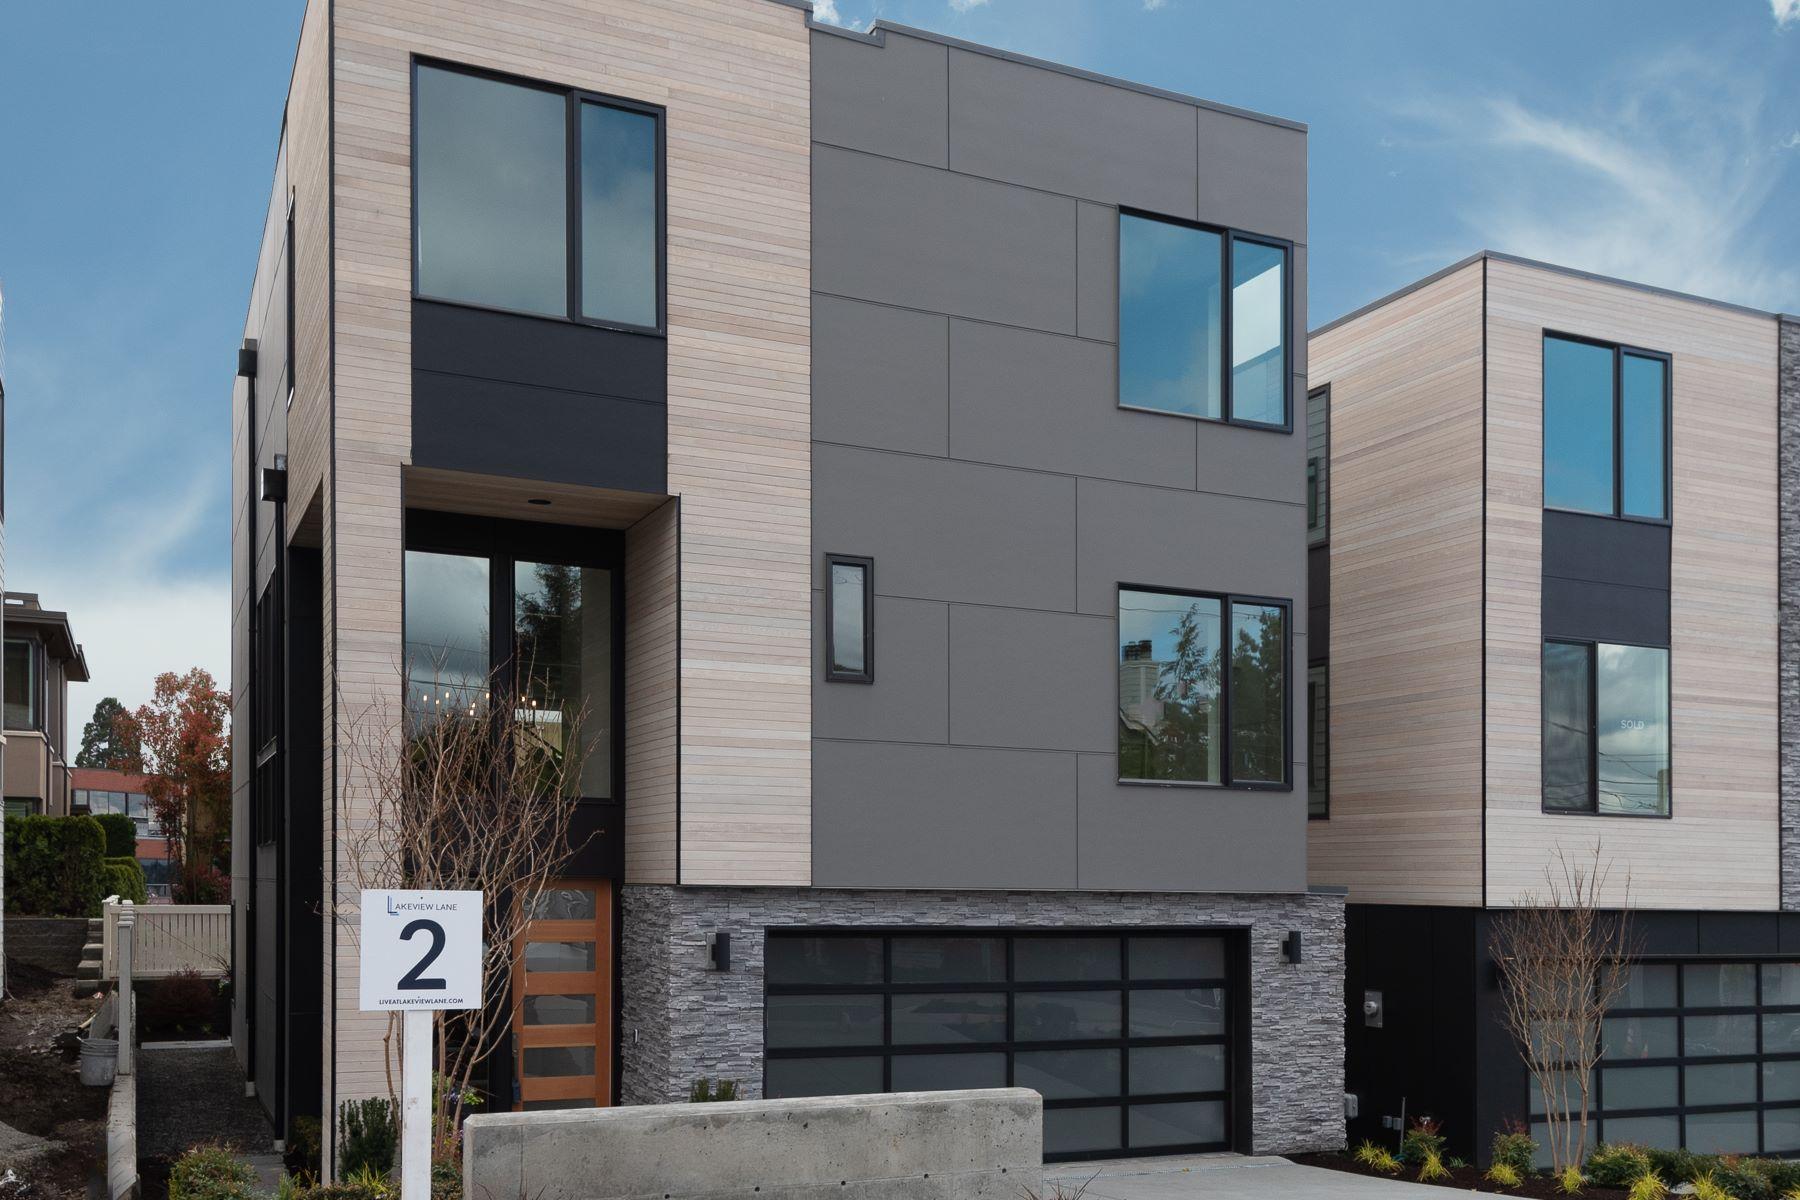 Condominiums for Sale at 10123 Northeast 60th Street (Unit 2), Kirkland, WA 98033 10123 NE 60th Street #2 Kirkland, Washington 98033 United States